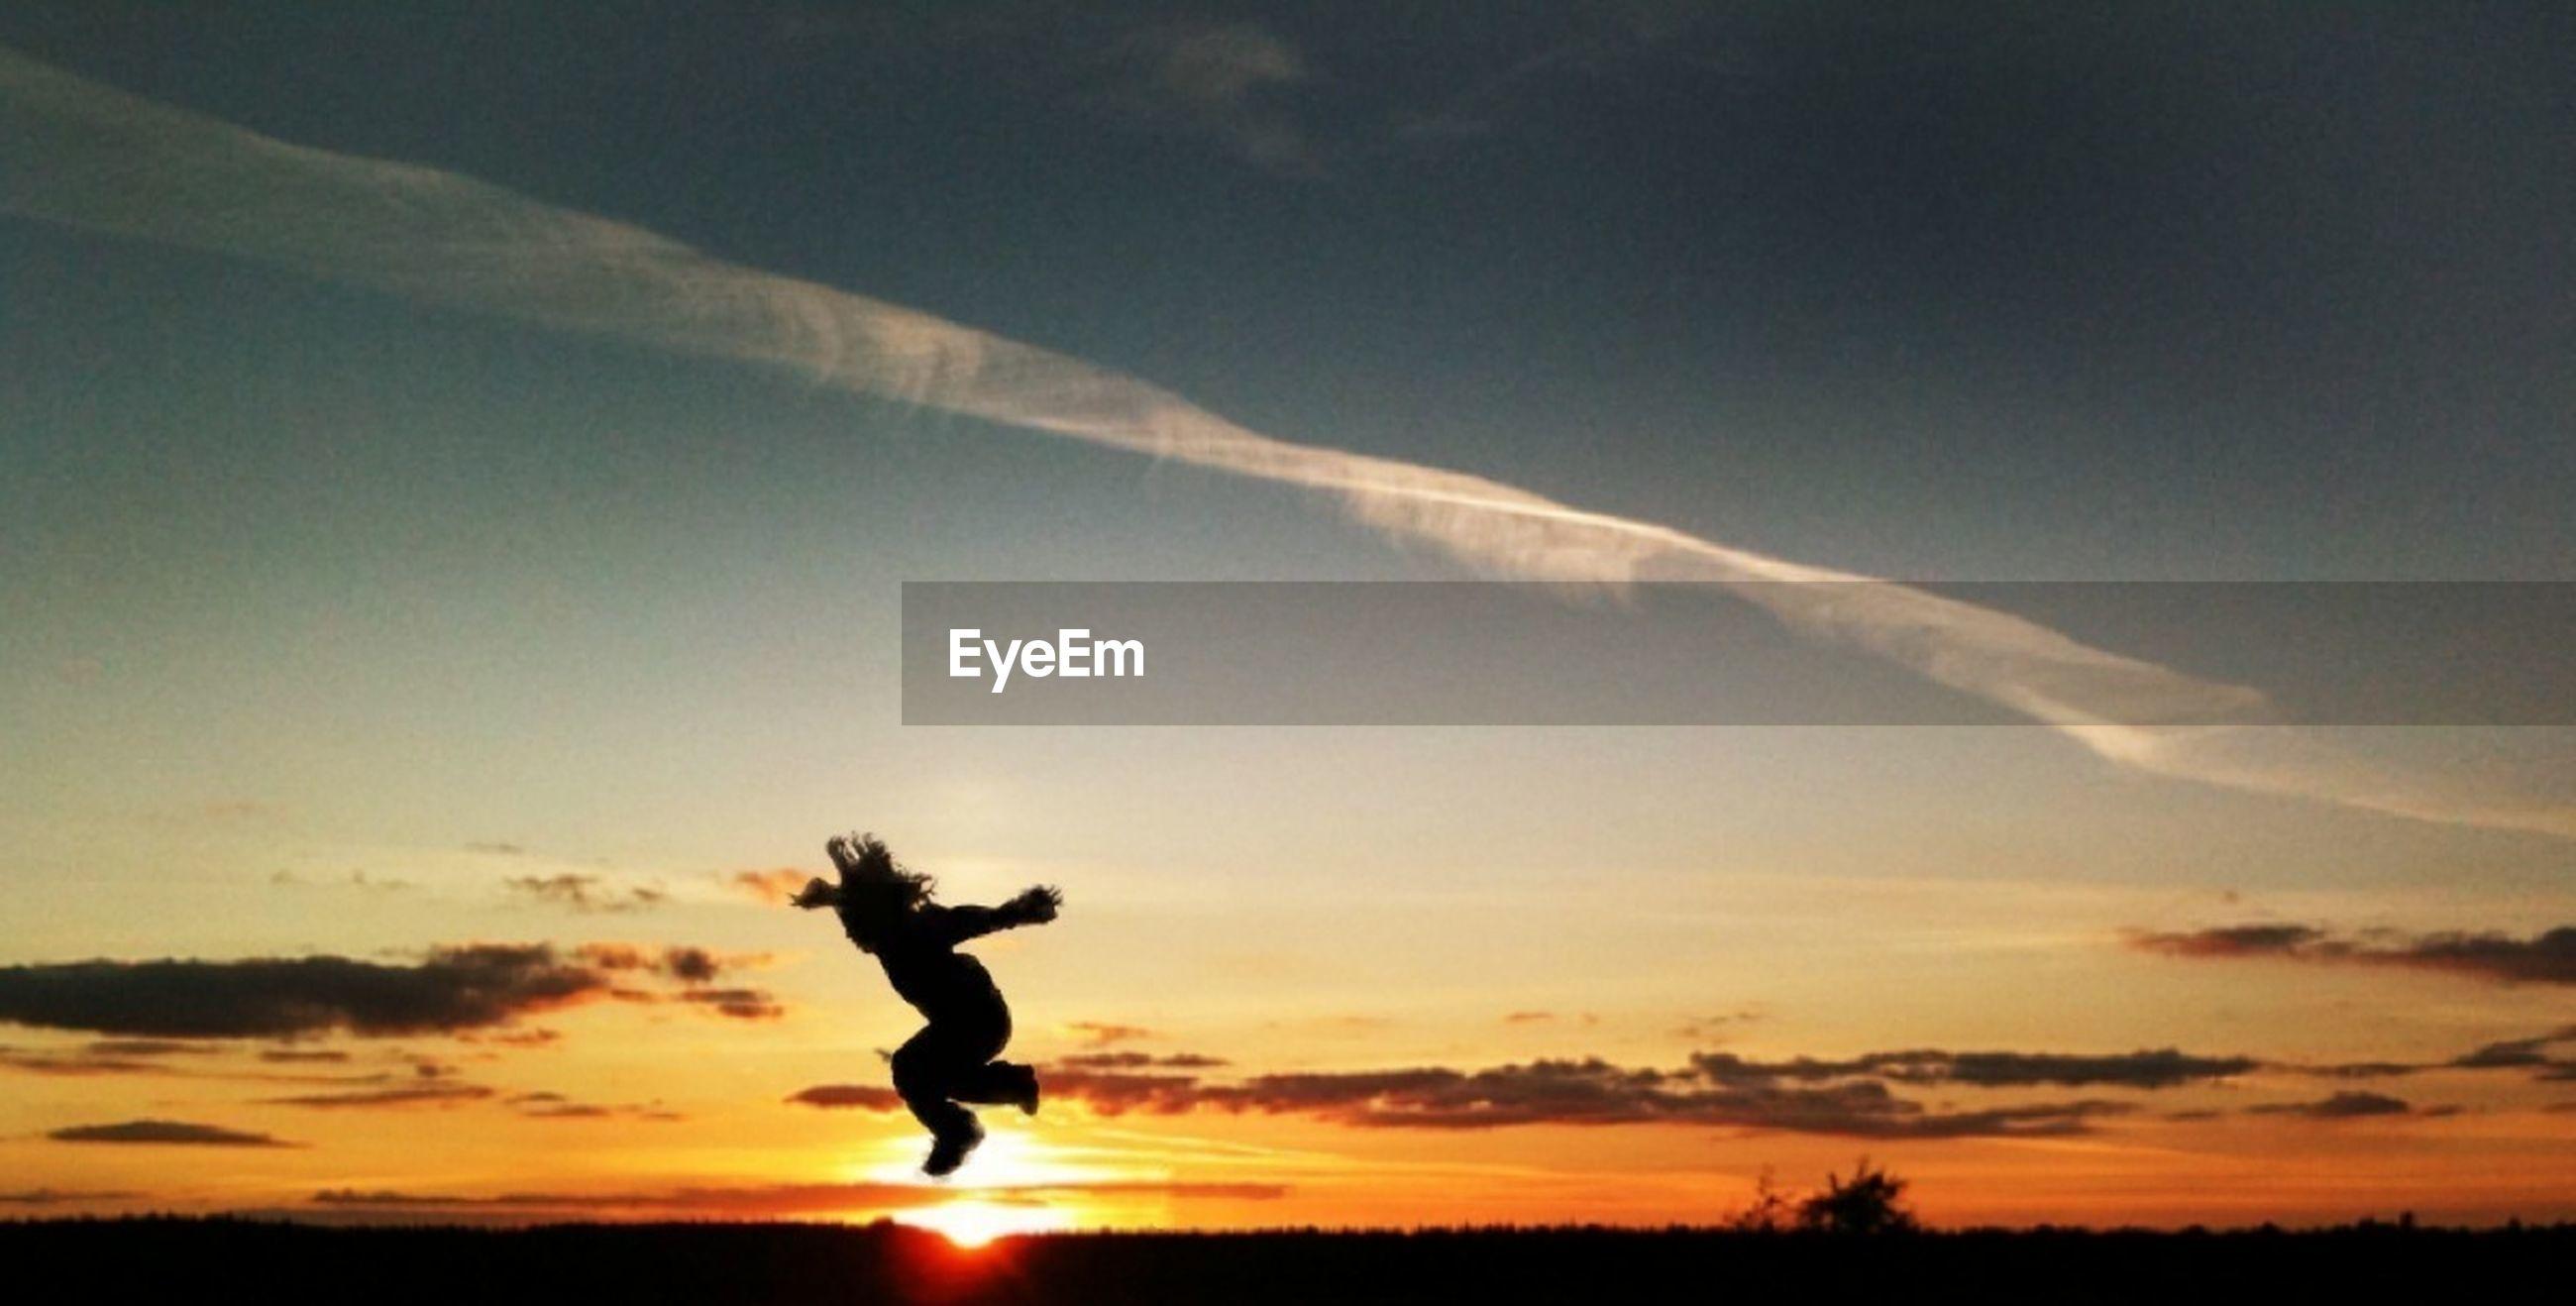 SUN SHINING THROUGH MAN JUMPING IN SKY